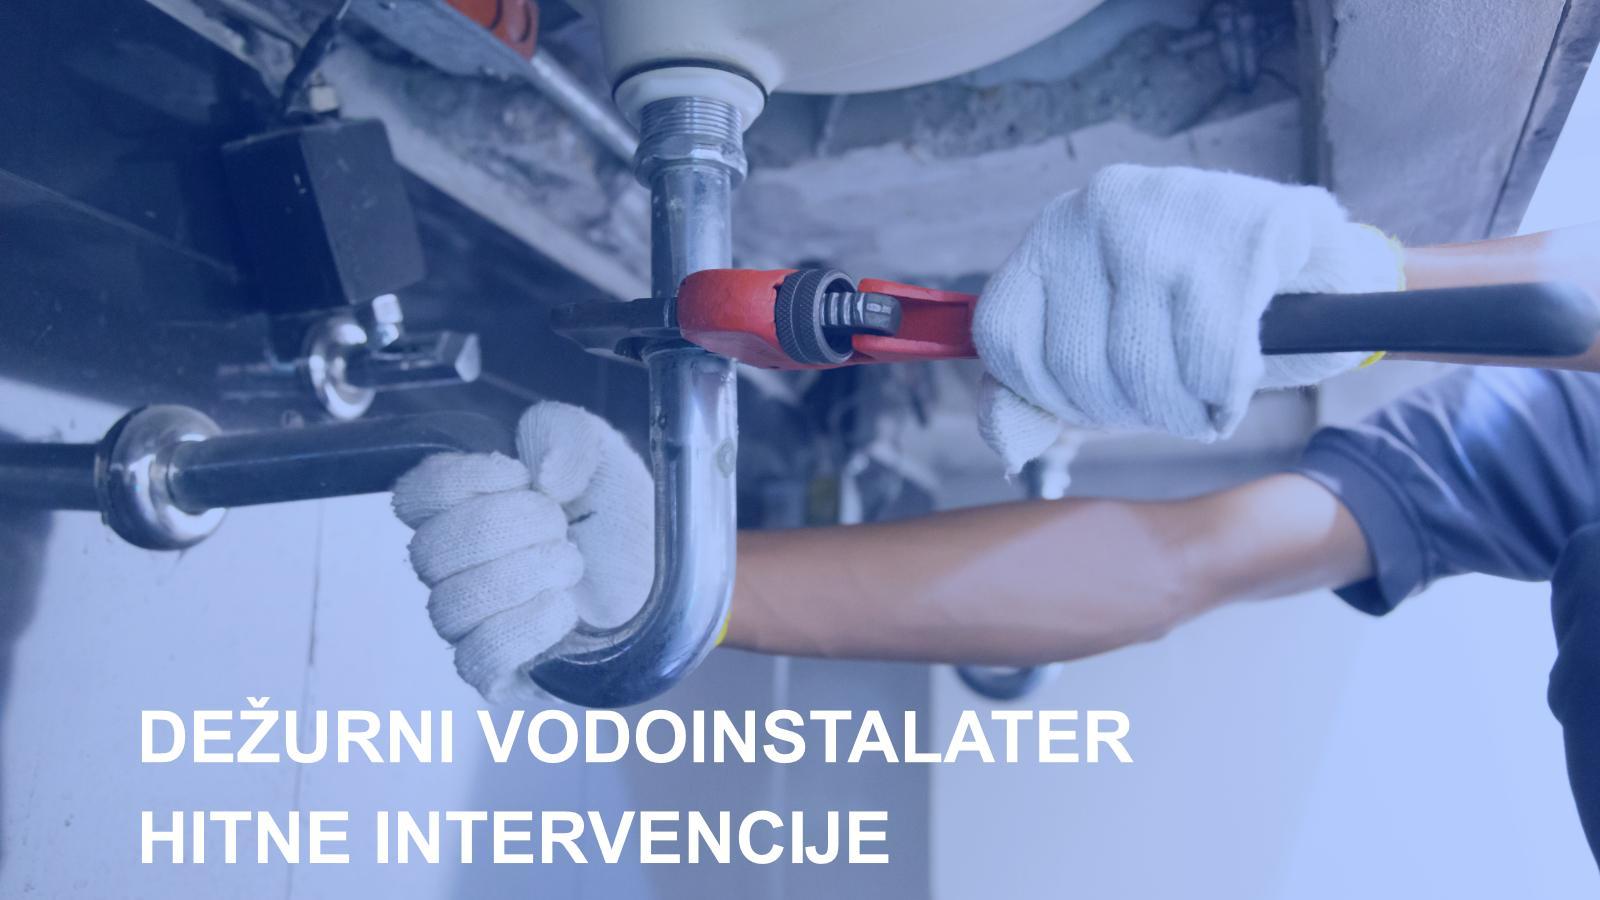 dezurni vodoinstalater za hitne intervencije